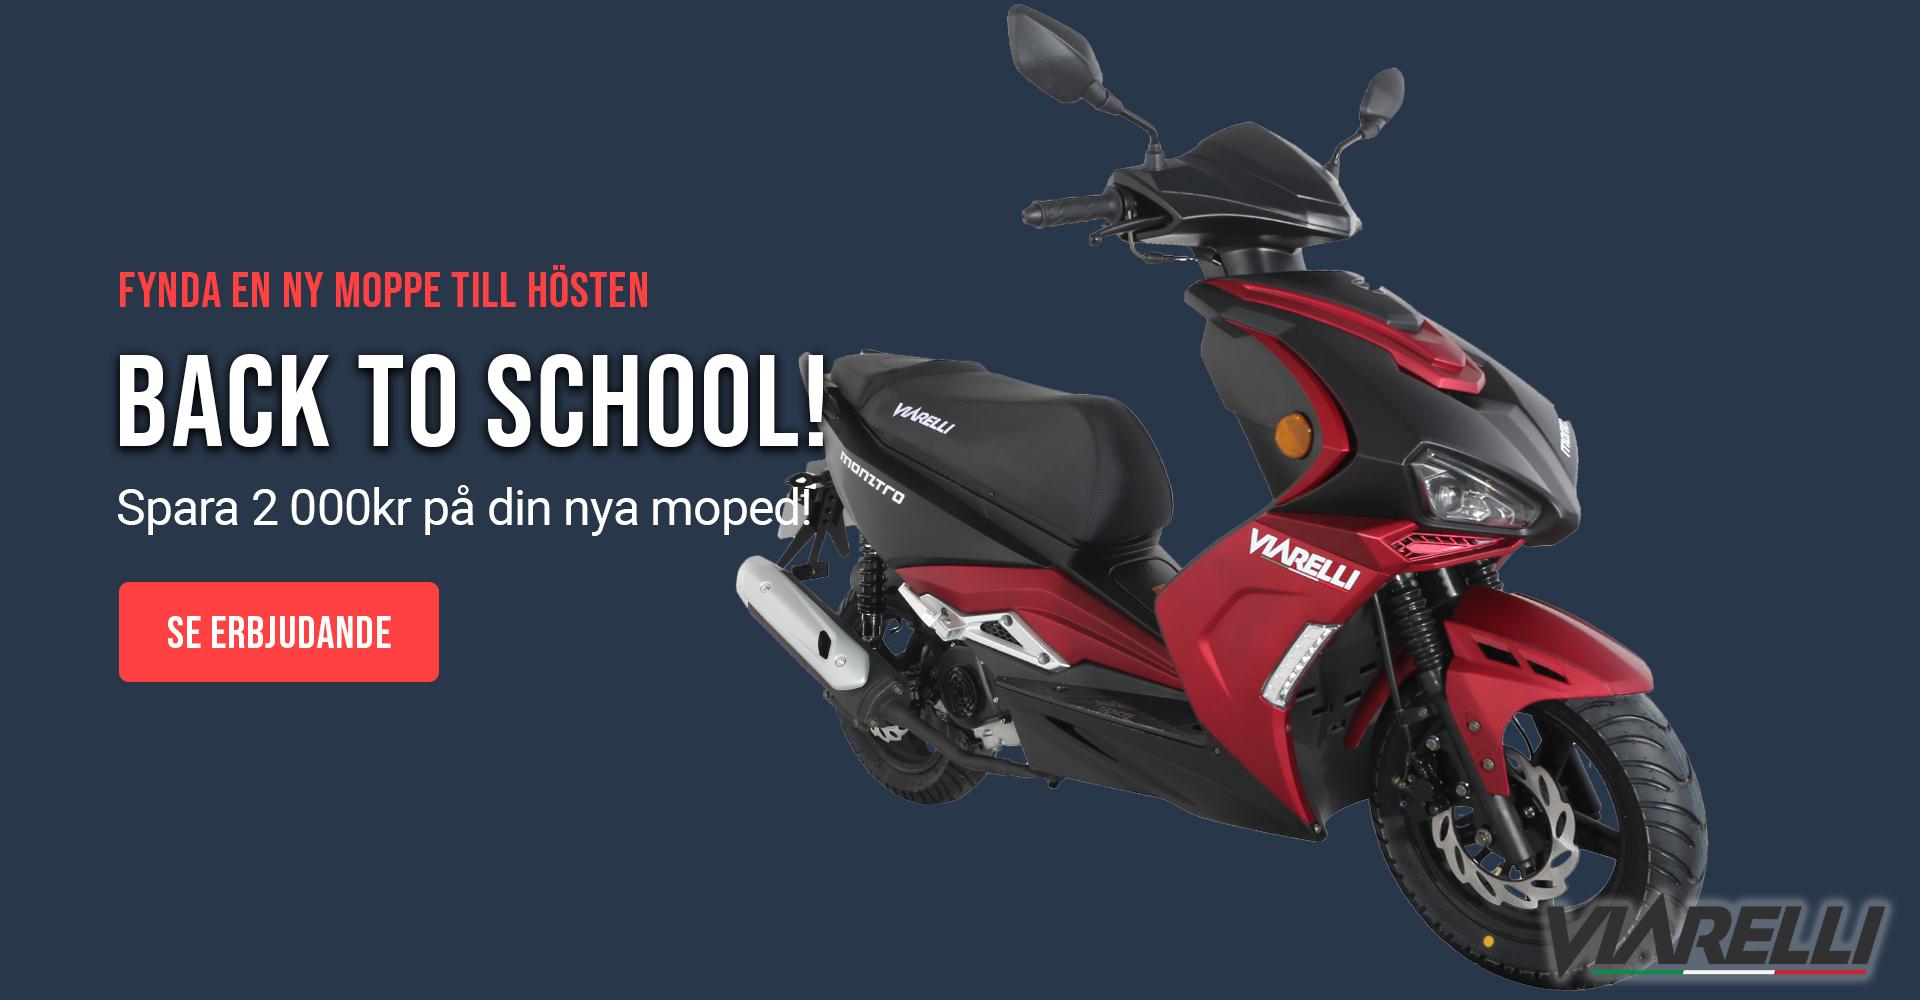 Mopedkampanj på motorsweden.se